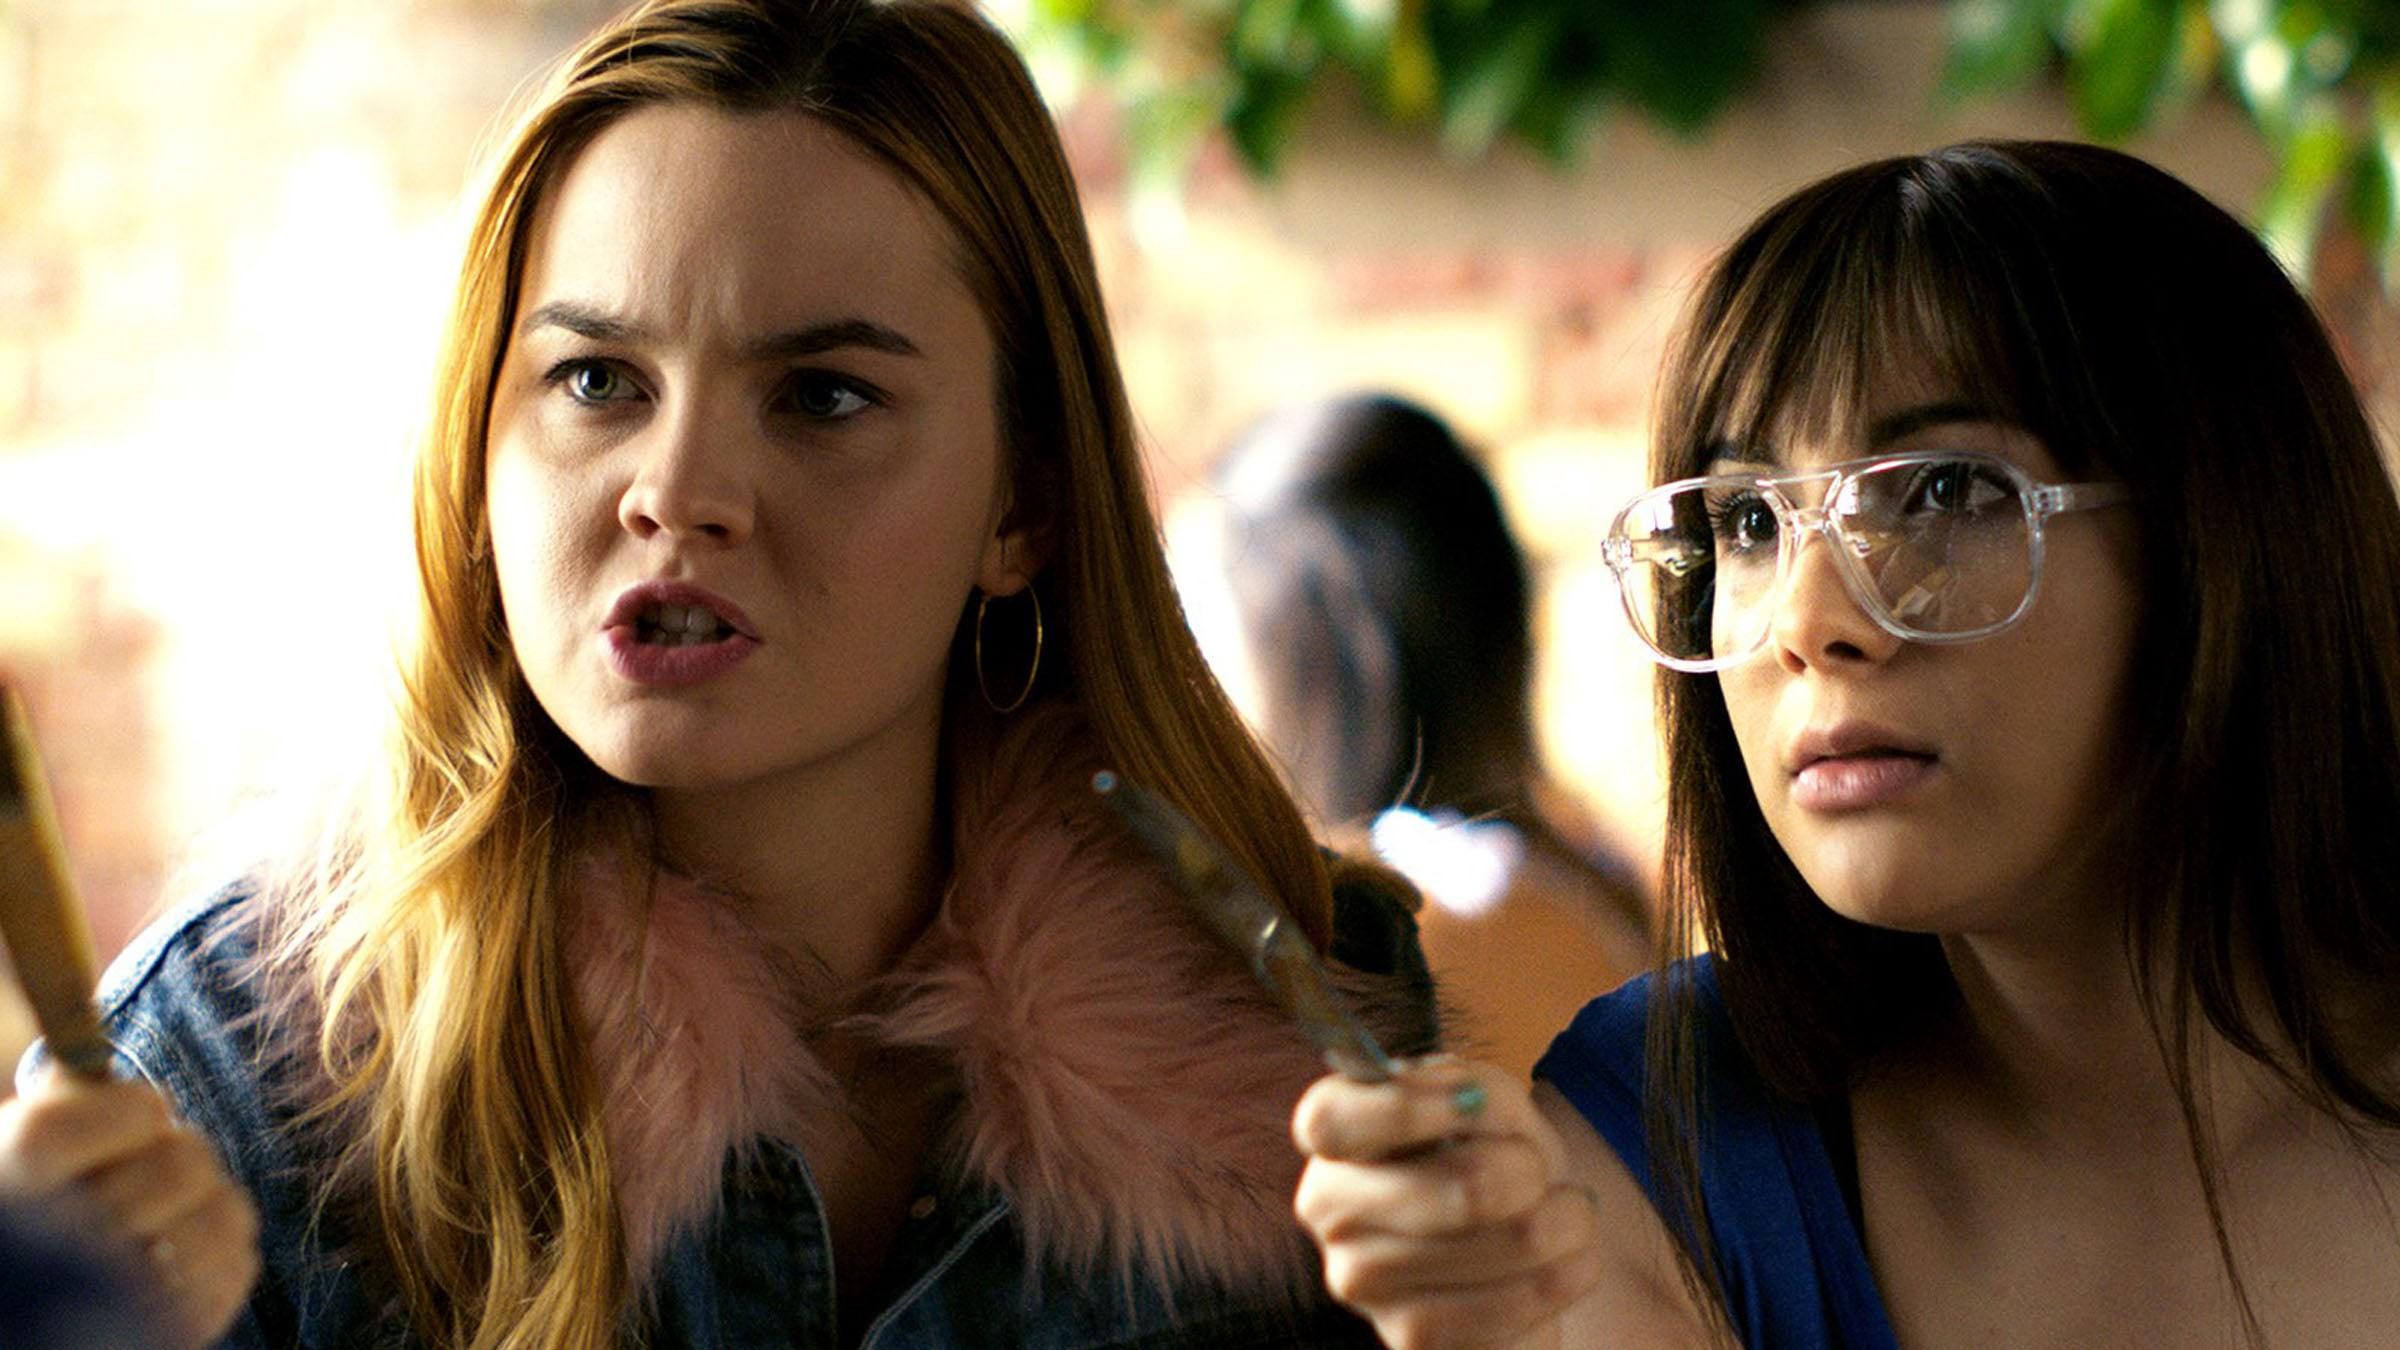 Clara (Liberato) and April (Marks) jokingly threaten their mutual friend Ben